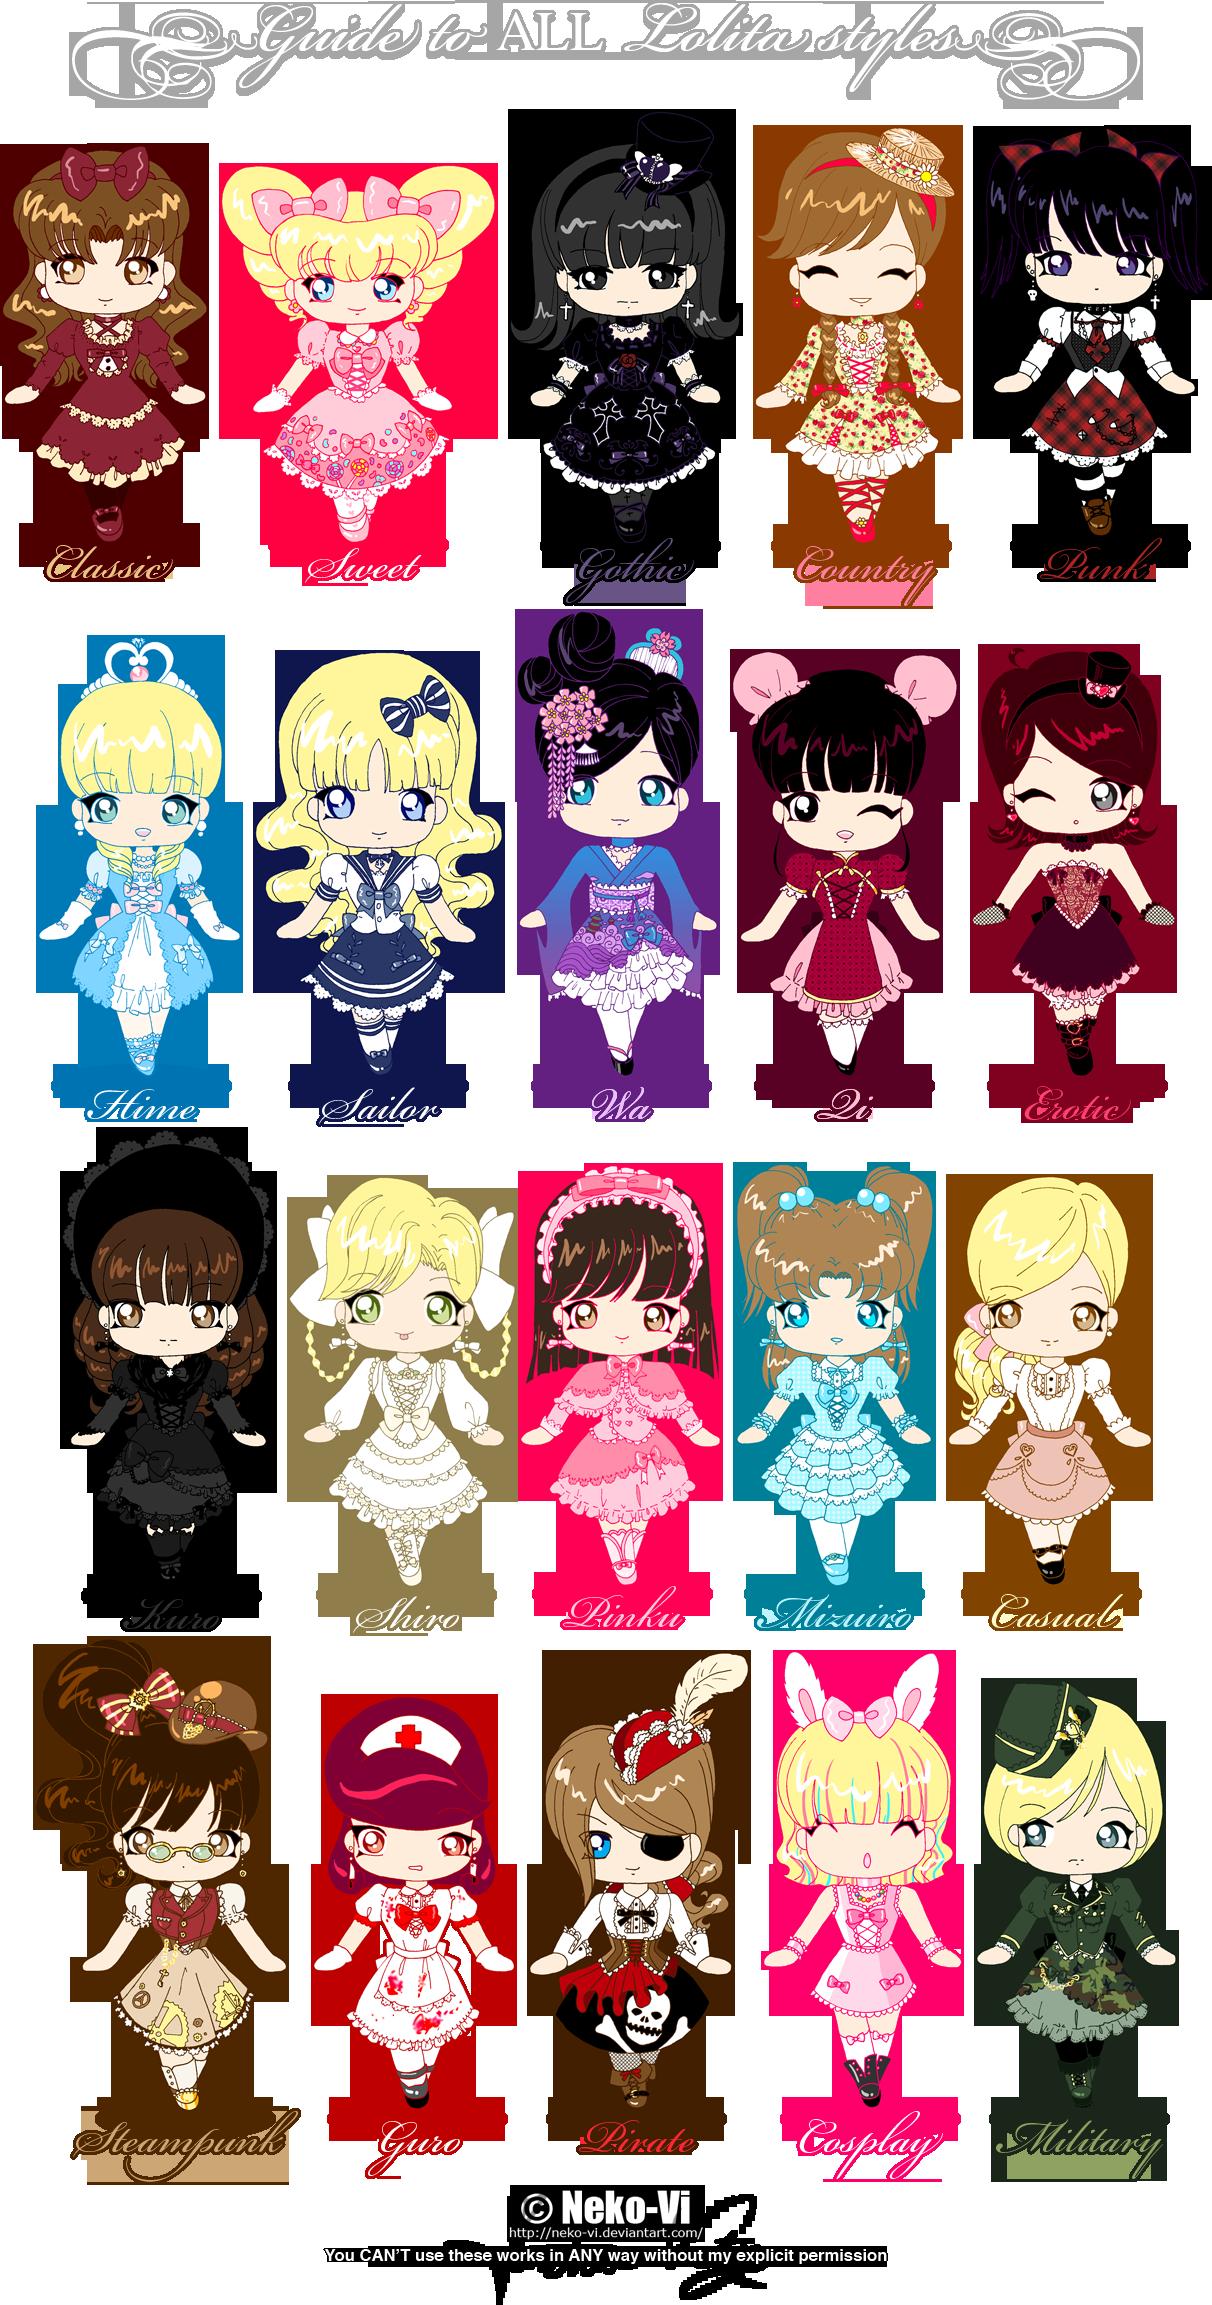 Guide To All Lolita Styles By Neko Vi On Deviantart